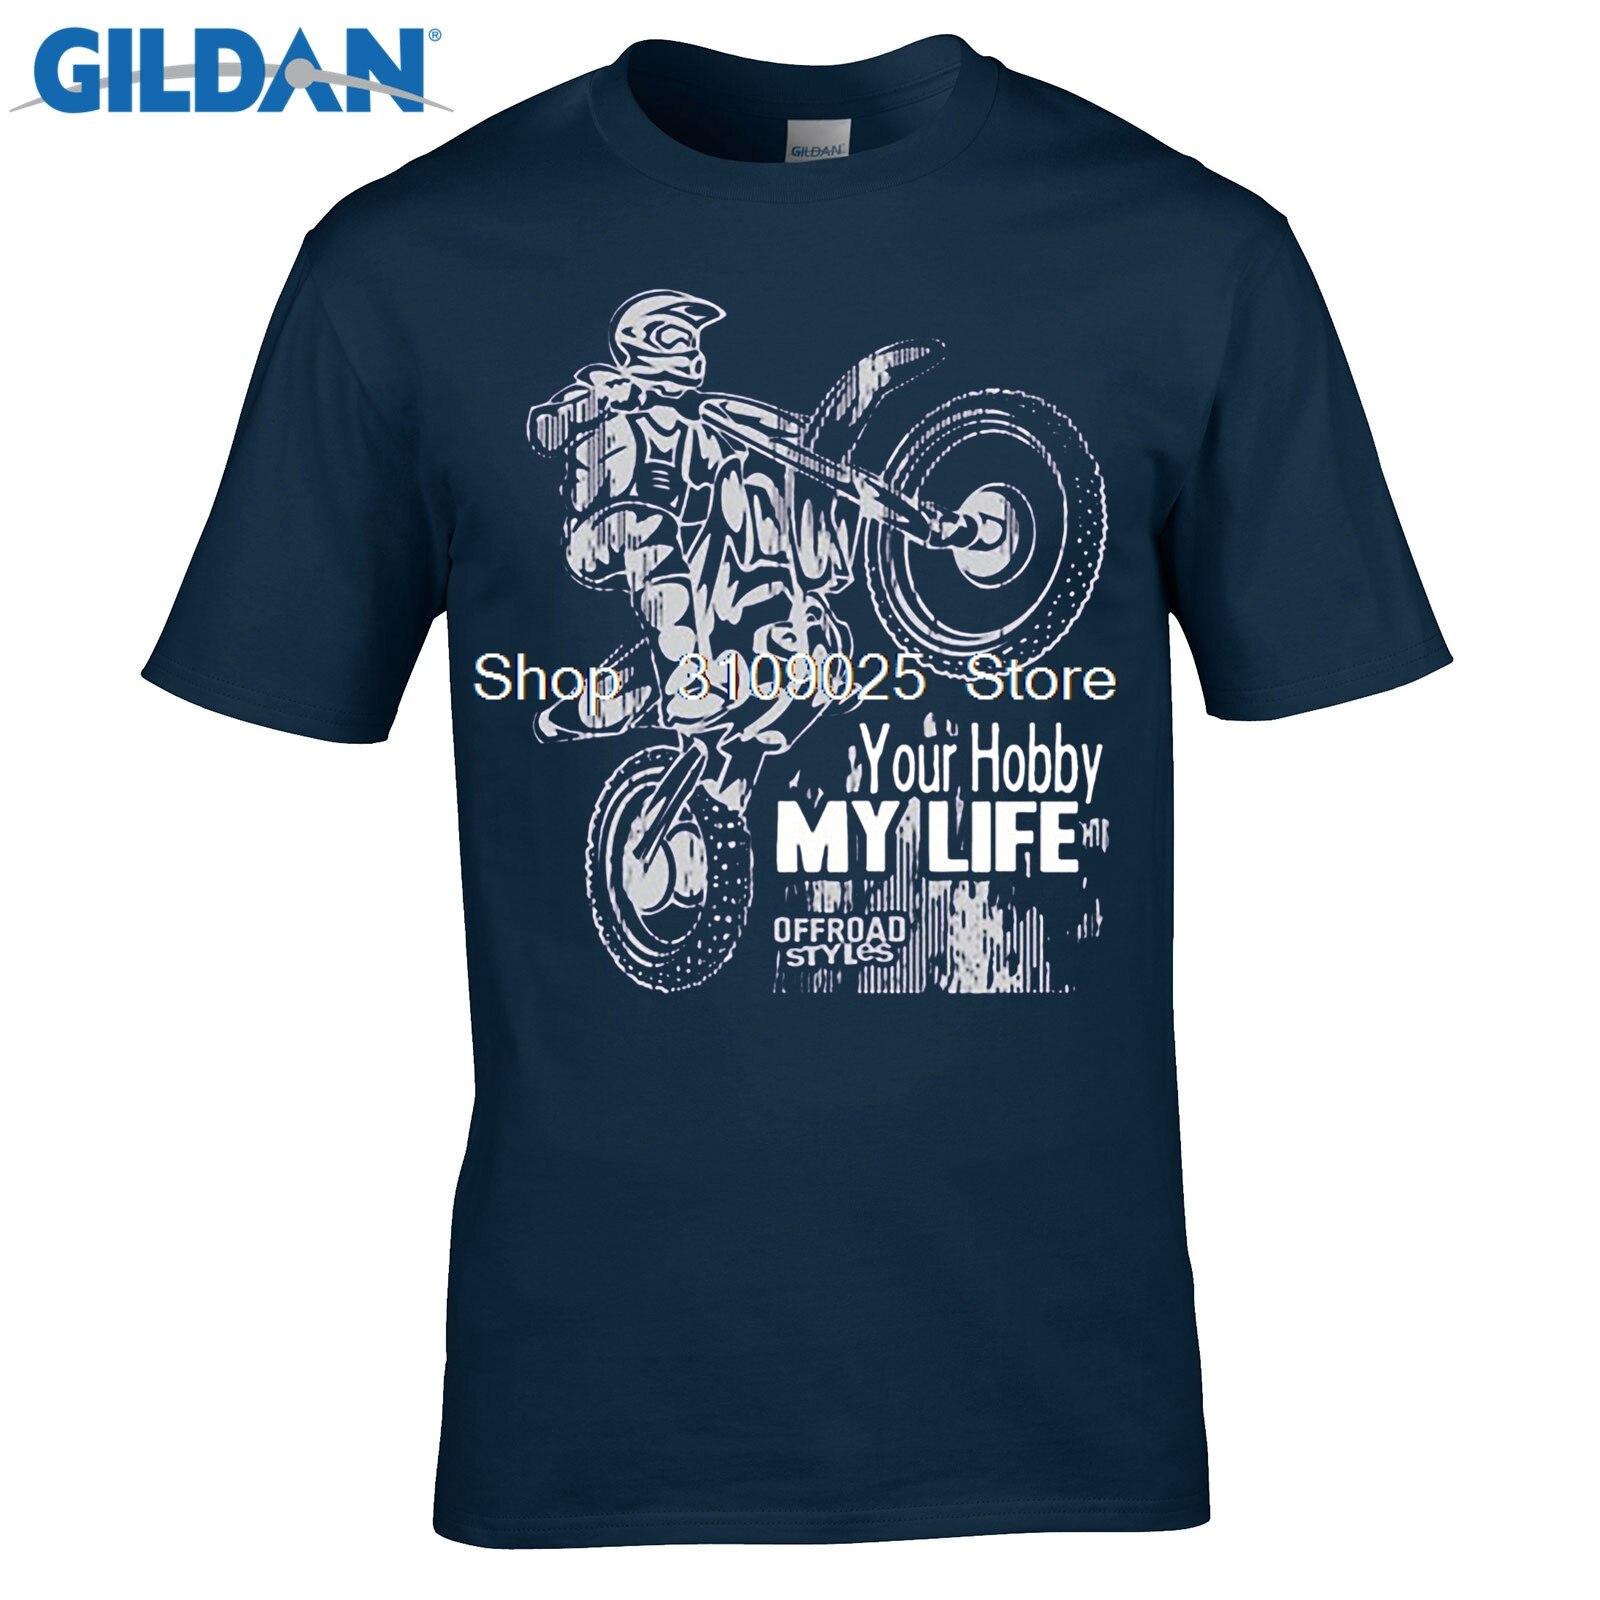 Gt86 design t shirts men s t shirt - Gildan Men Fashion Brand T Shirt Designed Locomotive Car Young Guy Top Screw Neck Motocross Your Hobby My Life Men Team T Shirts